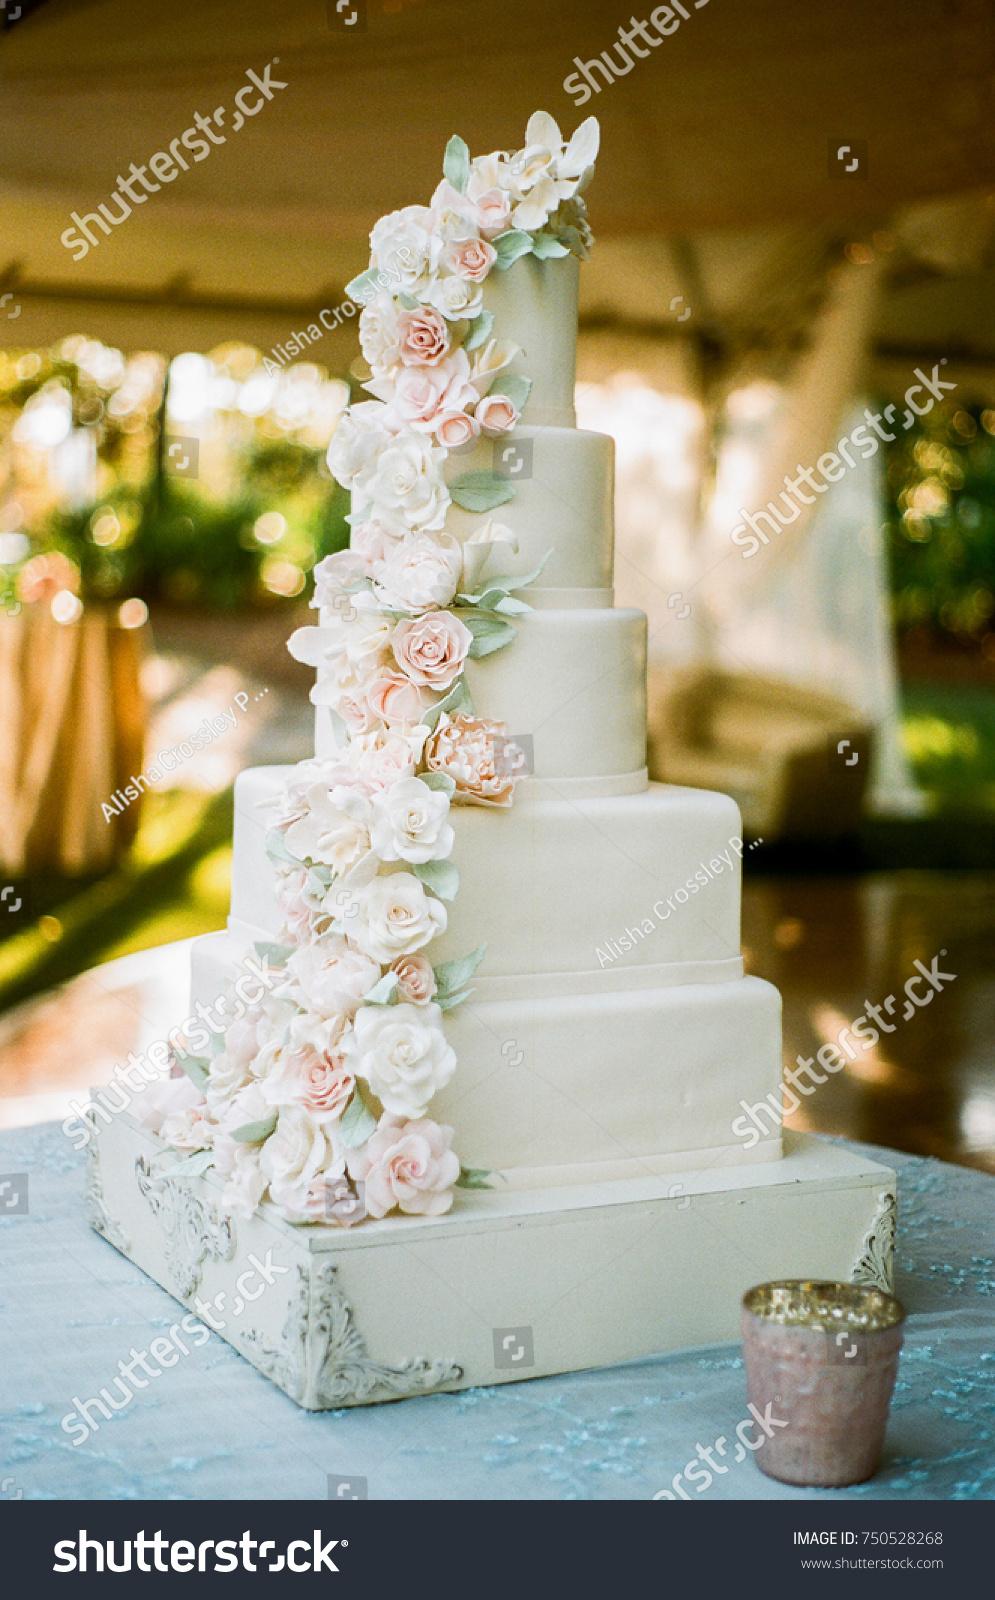 Elegant White Wedding Cake With Pink Flowers Ez Canvas